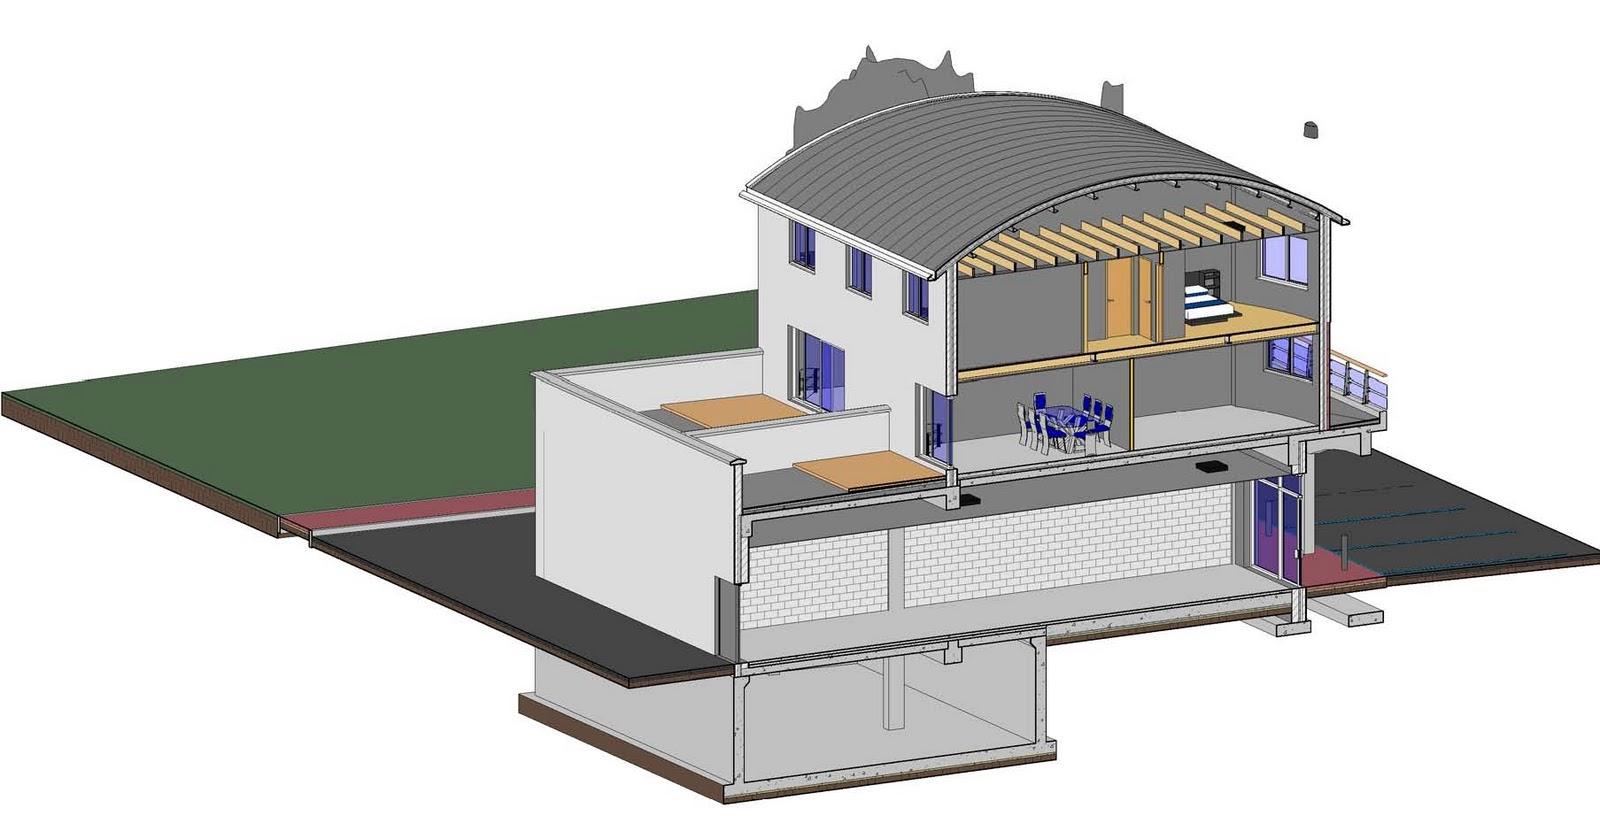 Revit detail 08 1 revision to a project part 1 for Revit architecture modern house design 8